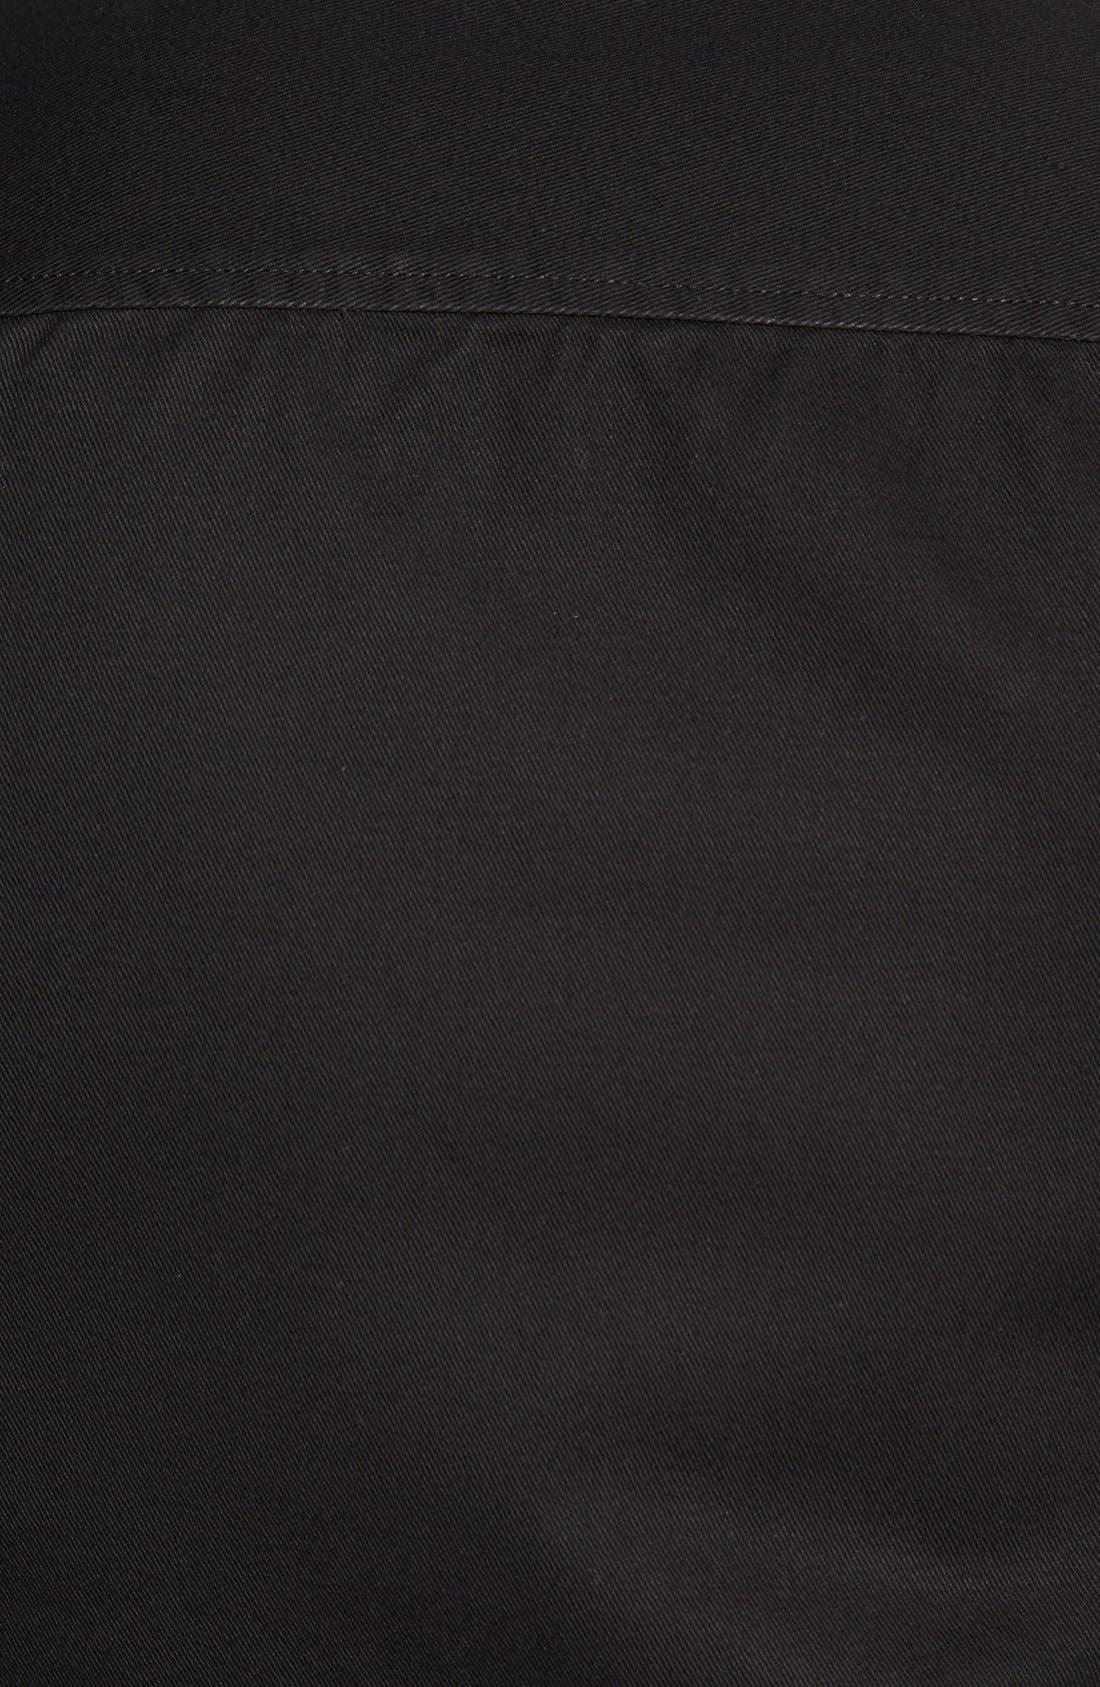 Alternate Image 2  - Public Opinion Trim Fit Denim Sport Shirt